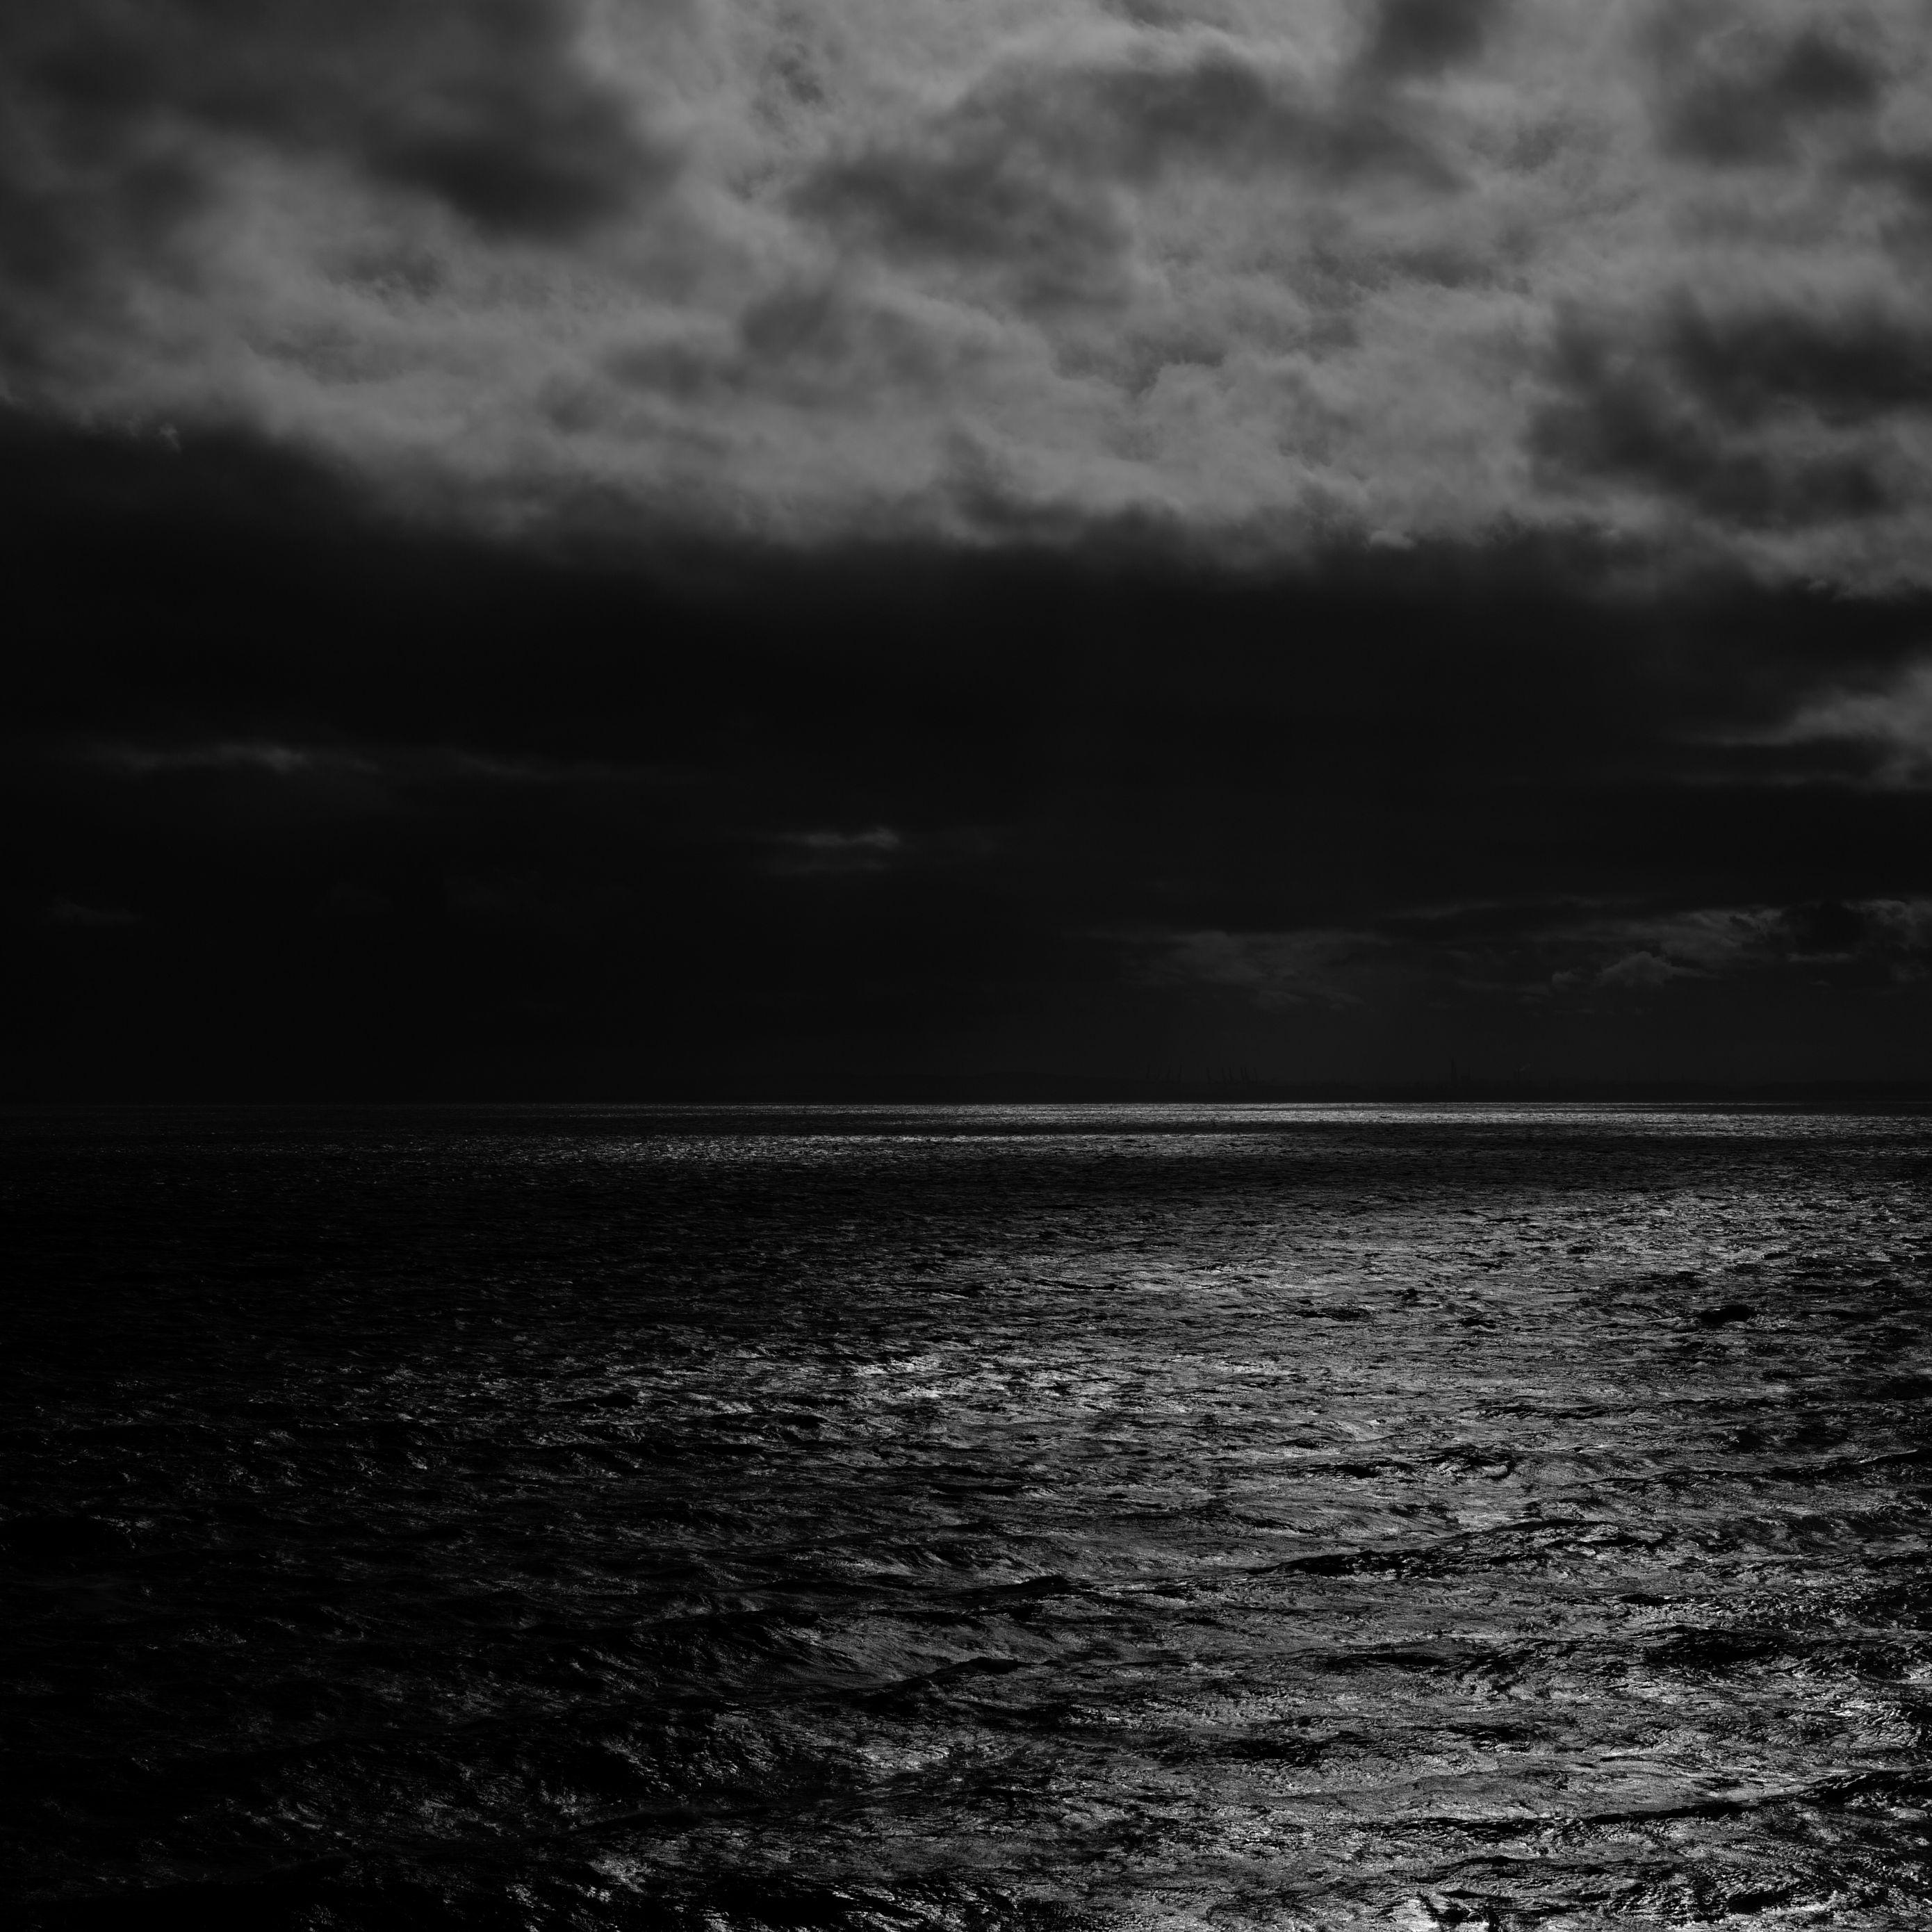 2780x2780 Wallpaper sea, horizon, bw, overcast, clouds, ripples